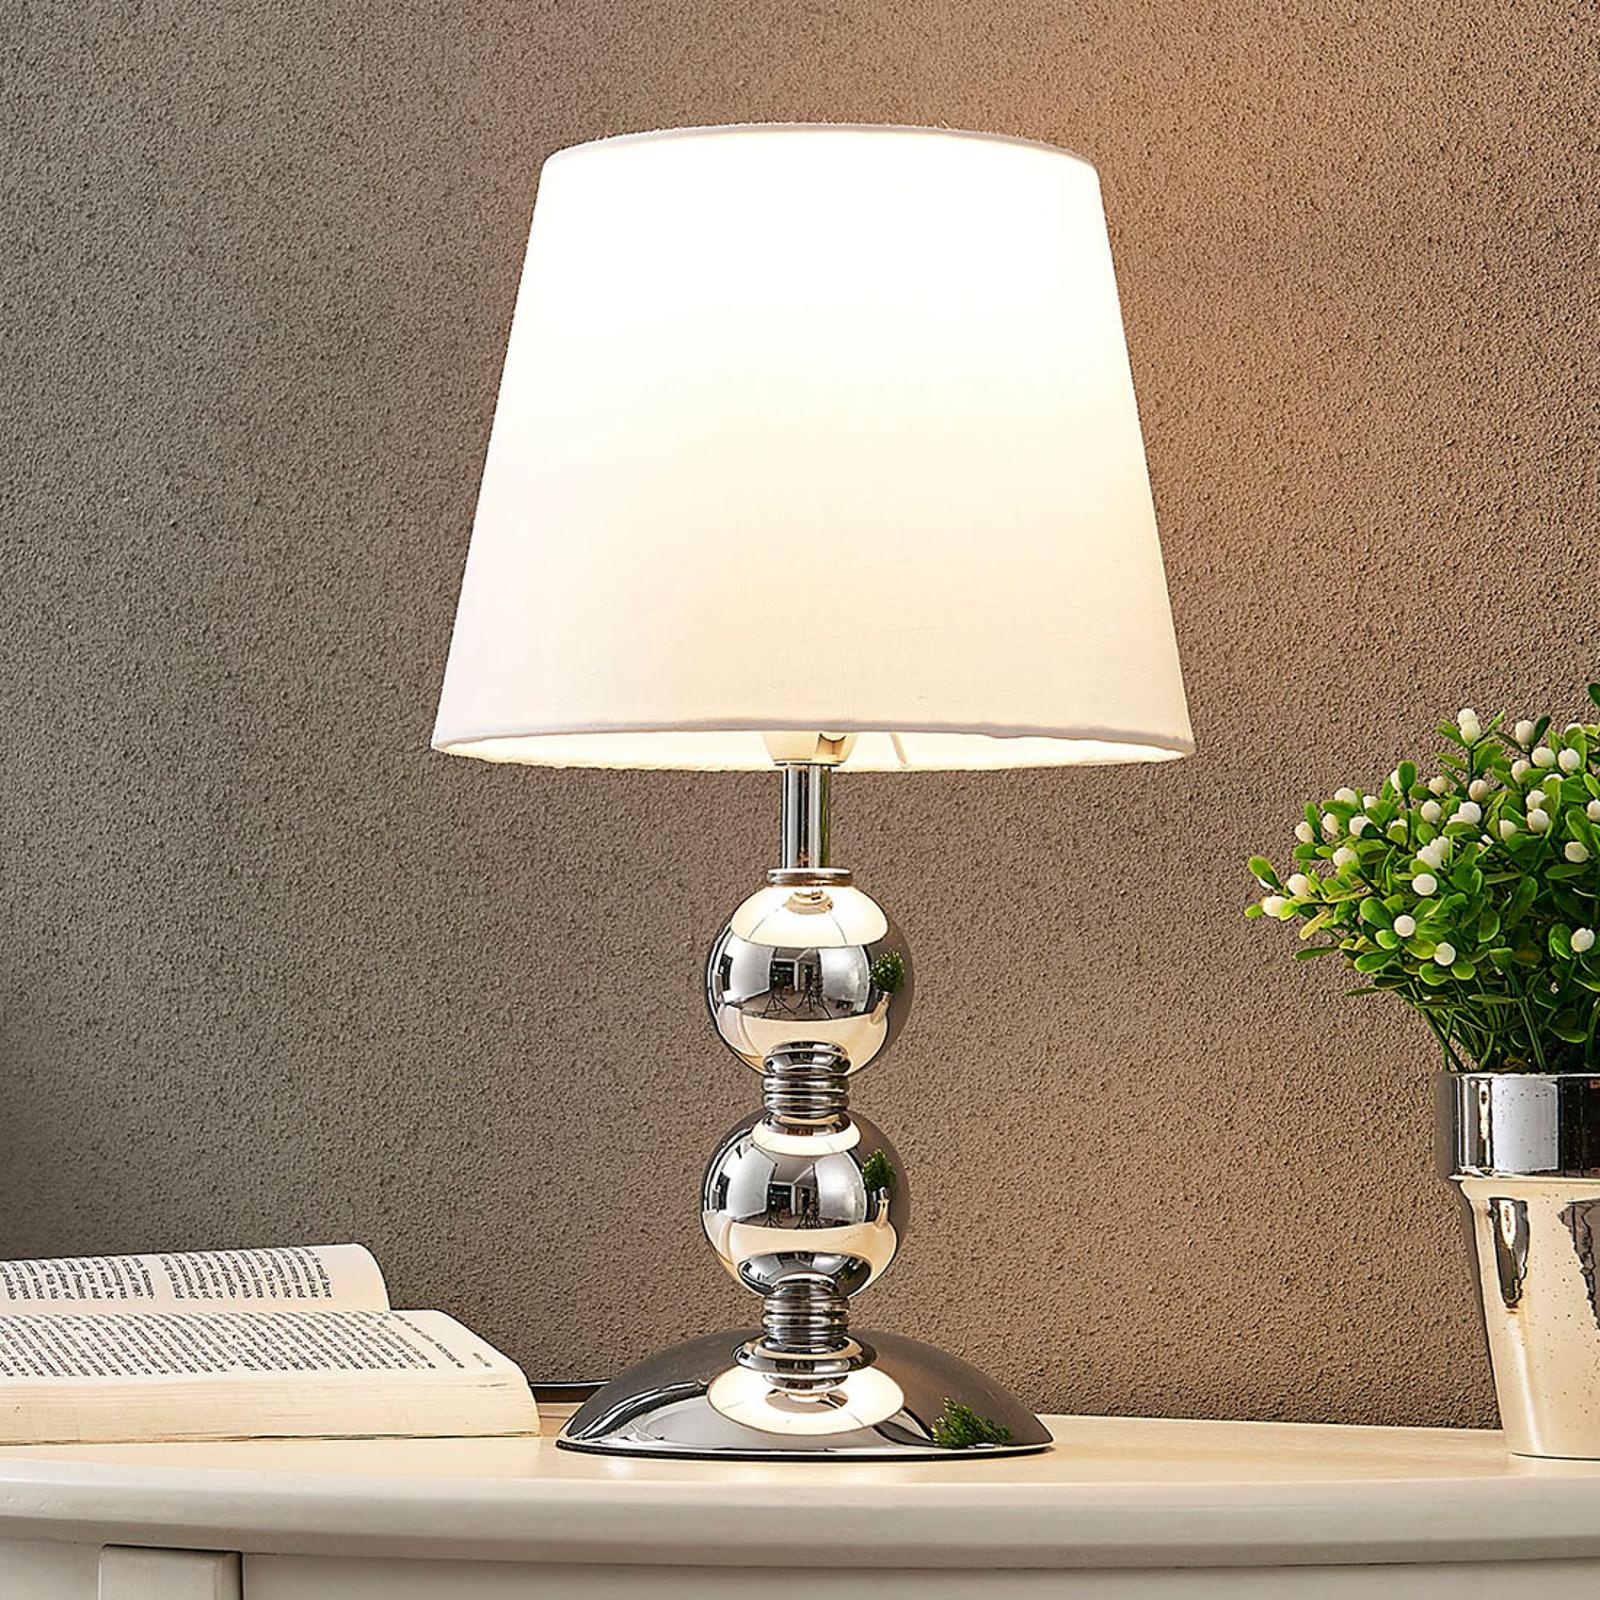 Elegant LED-bordslampa Minna i satin-look